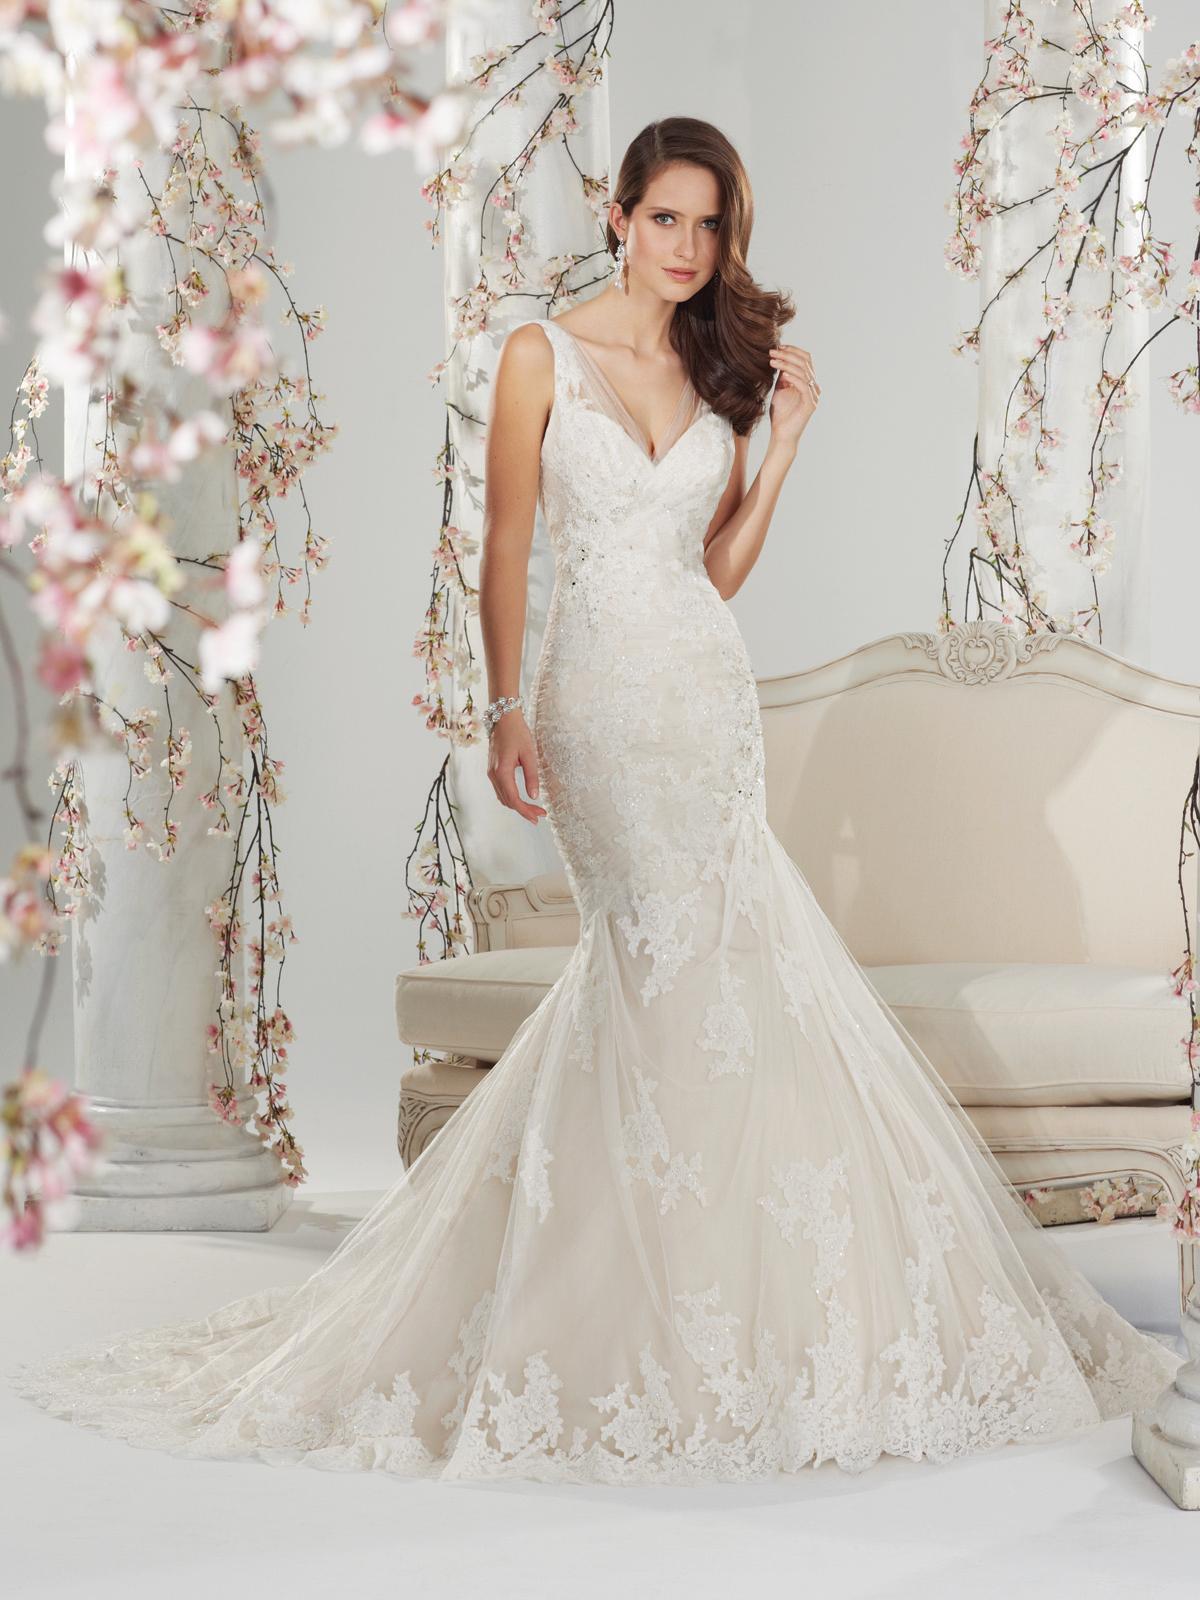 Wedding Dresses For   Sunshine Coast : Y margaery sunshine coast wedding dresses